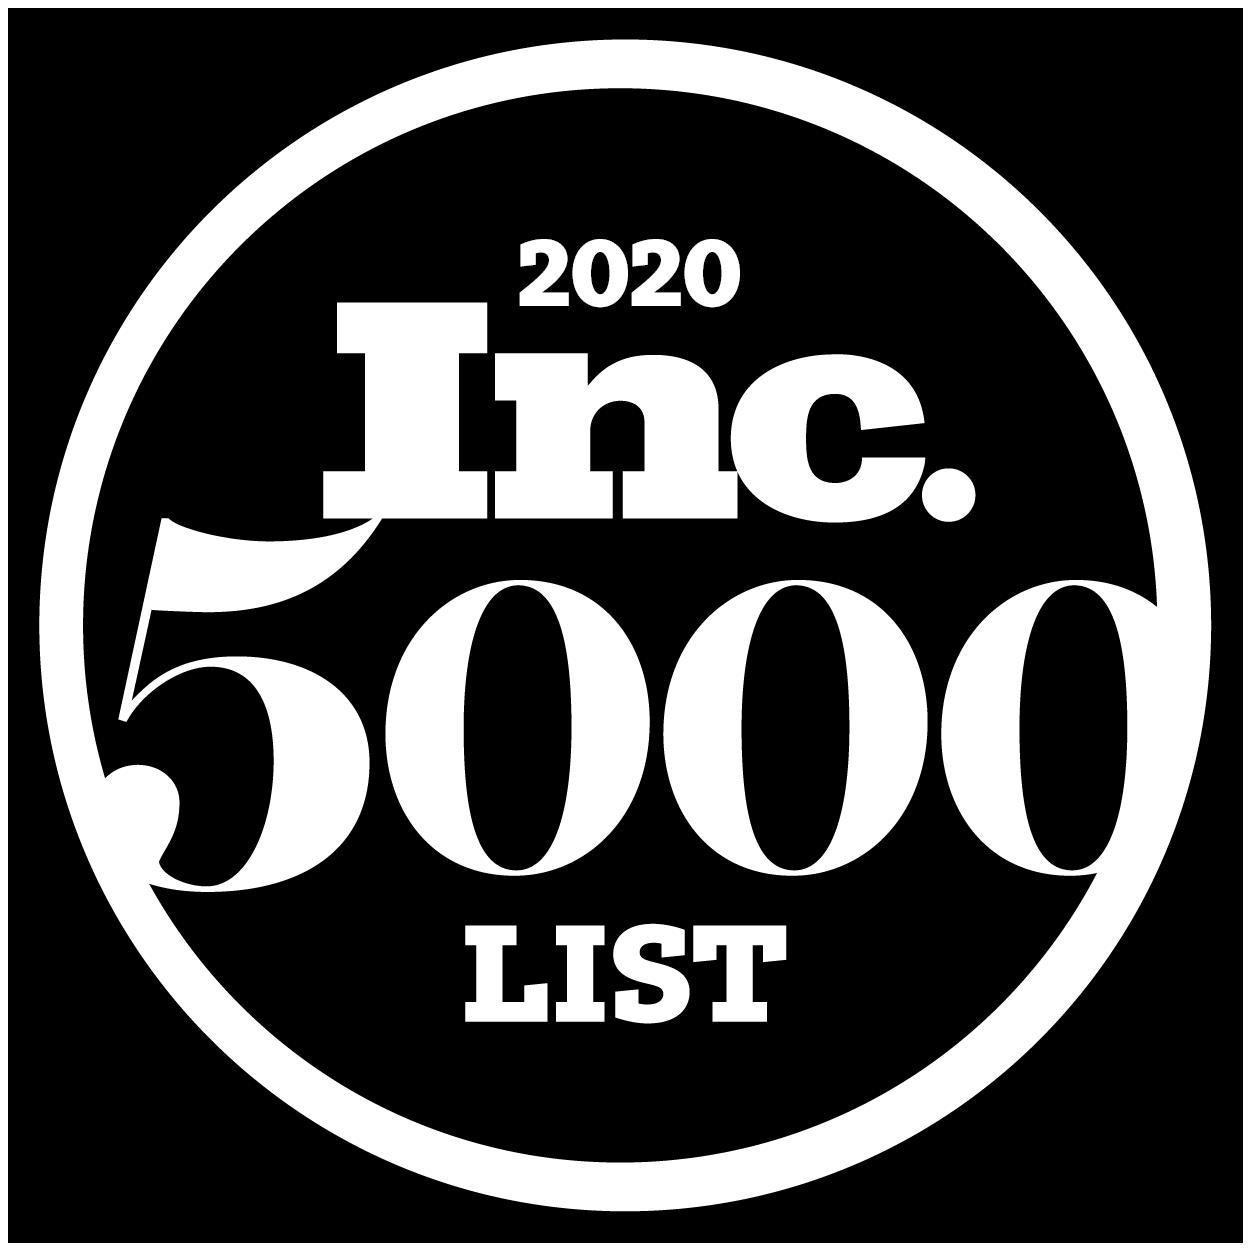 Inc 5000 badge